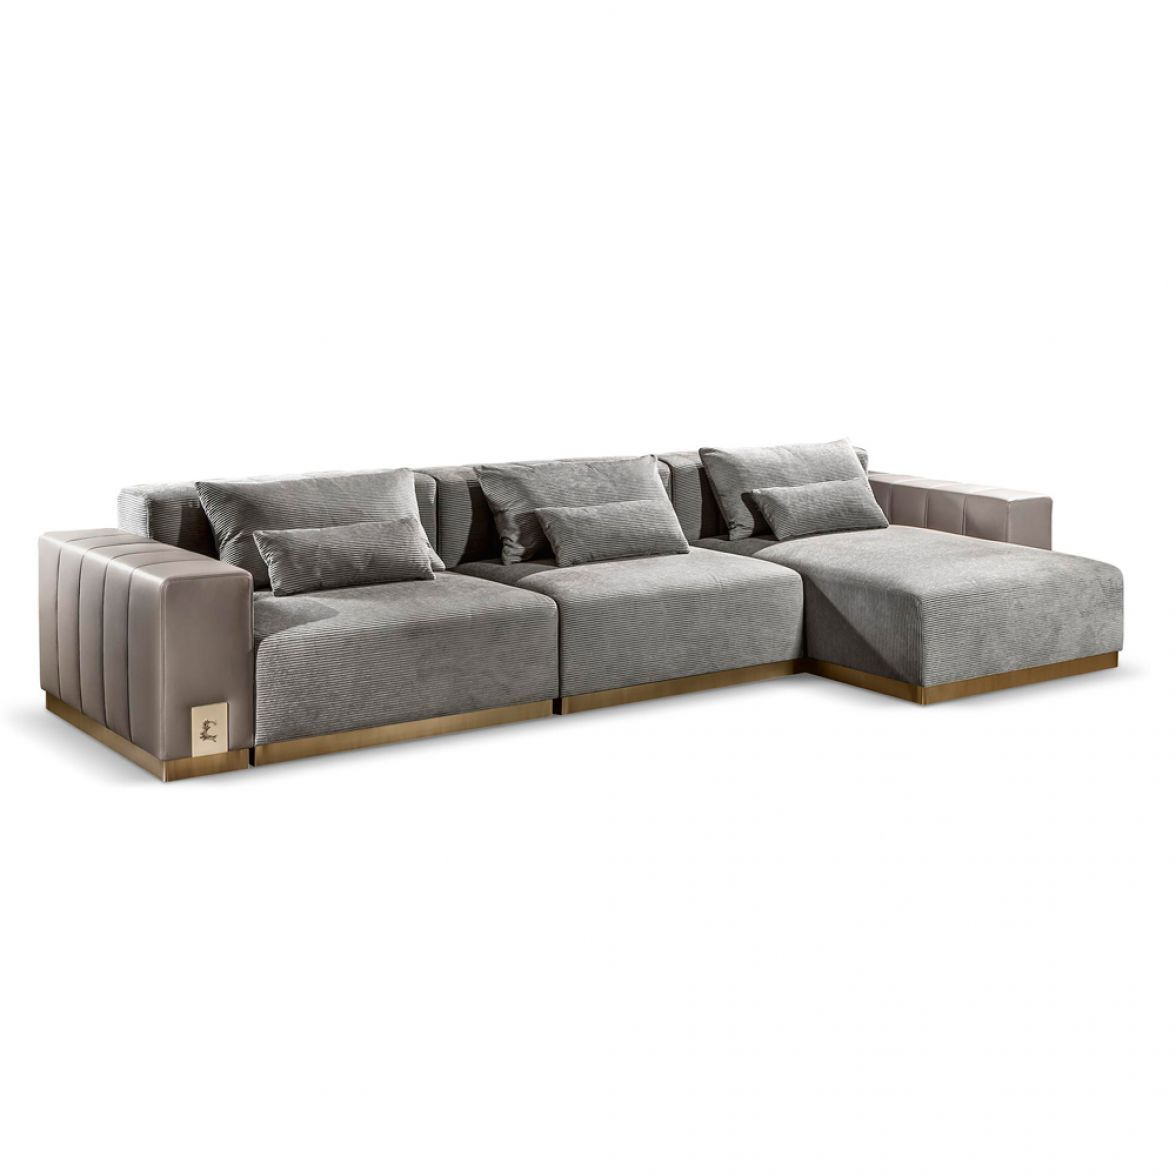 Vietri sofa